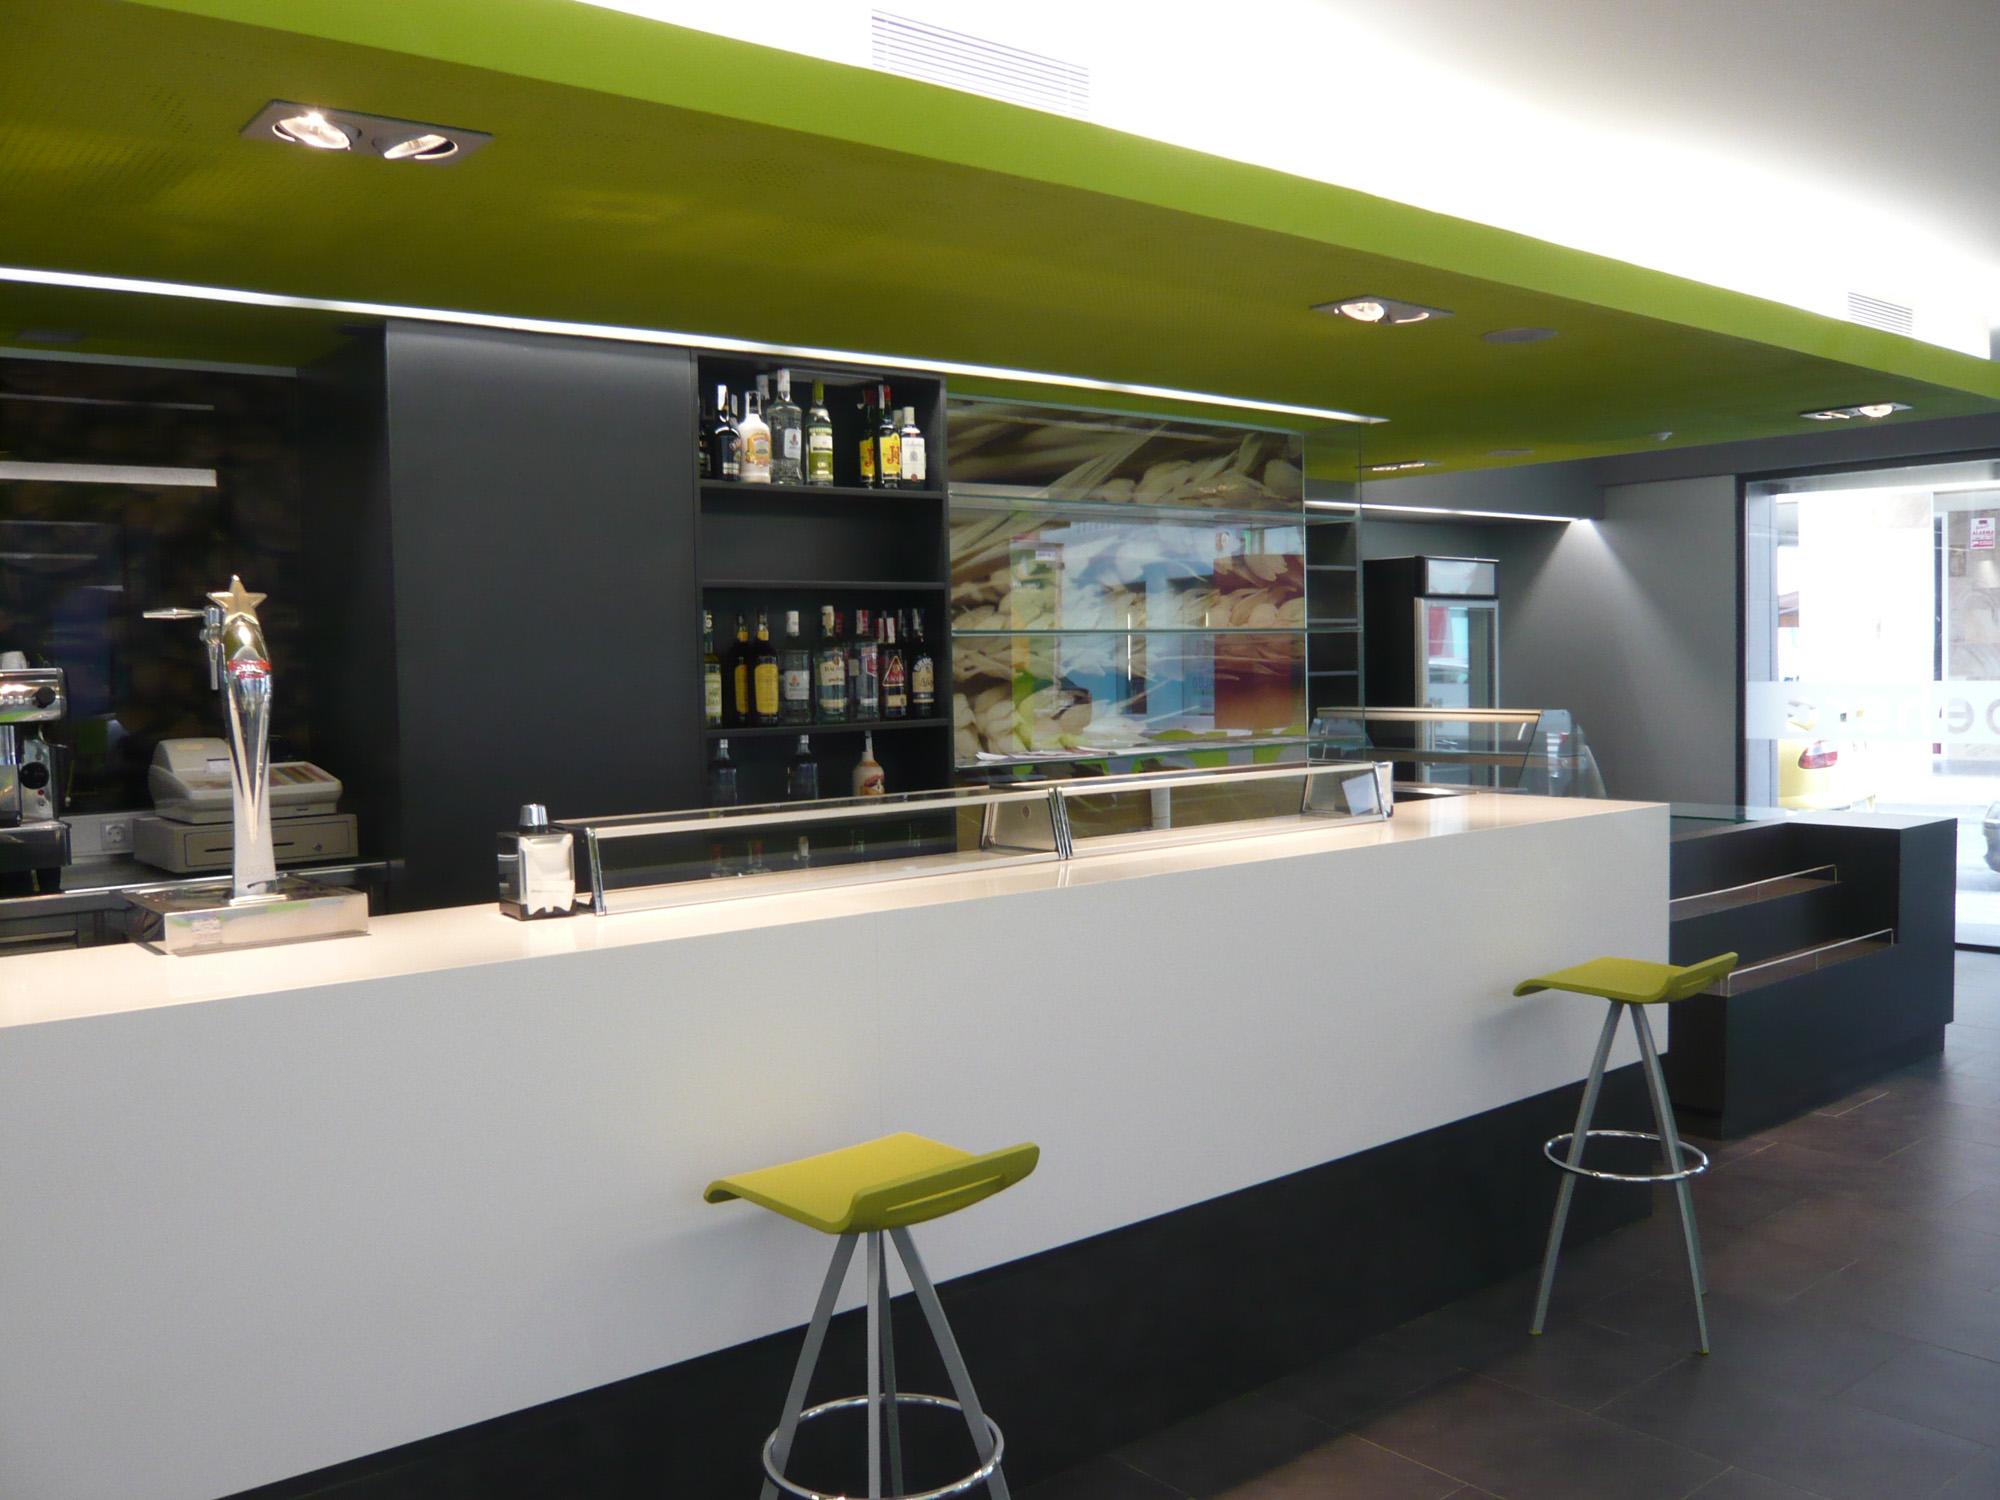 Cafeter a bar gora behera reformas de viviendas - Proyecto bar cafeteria ...